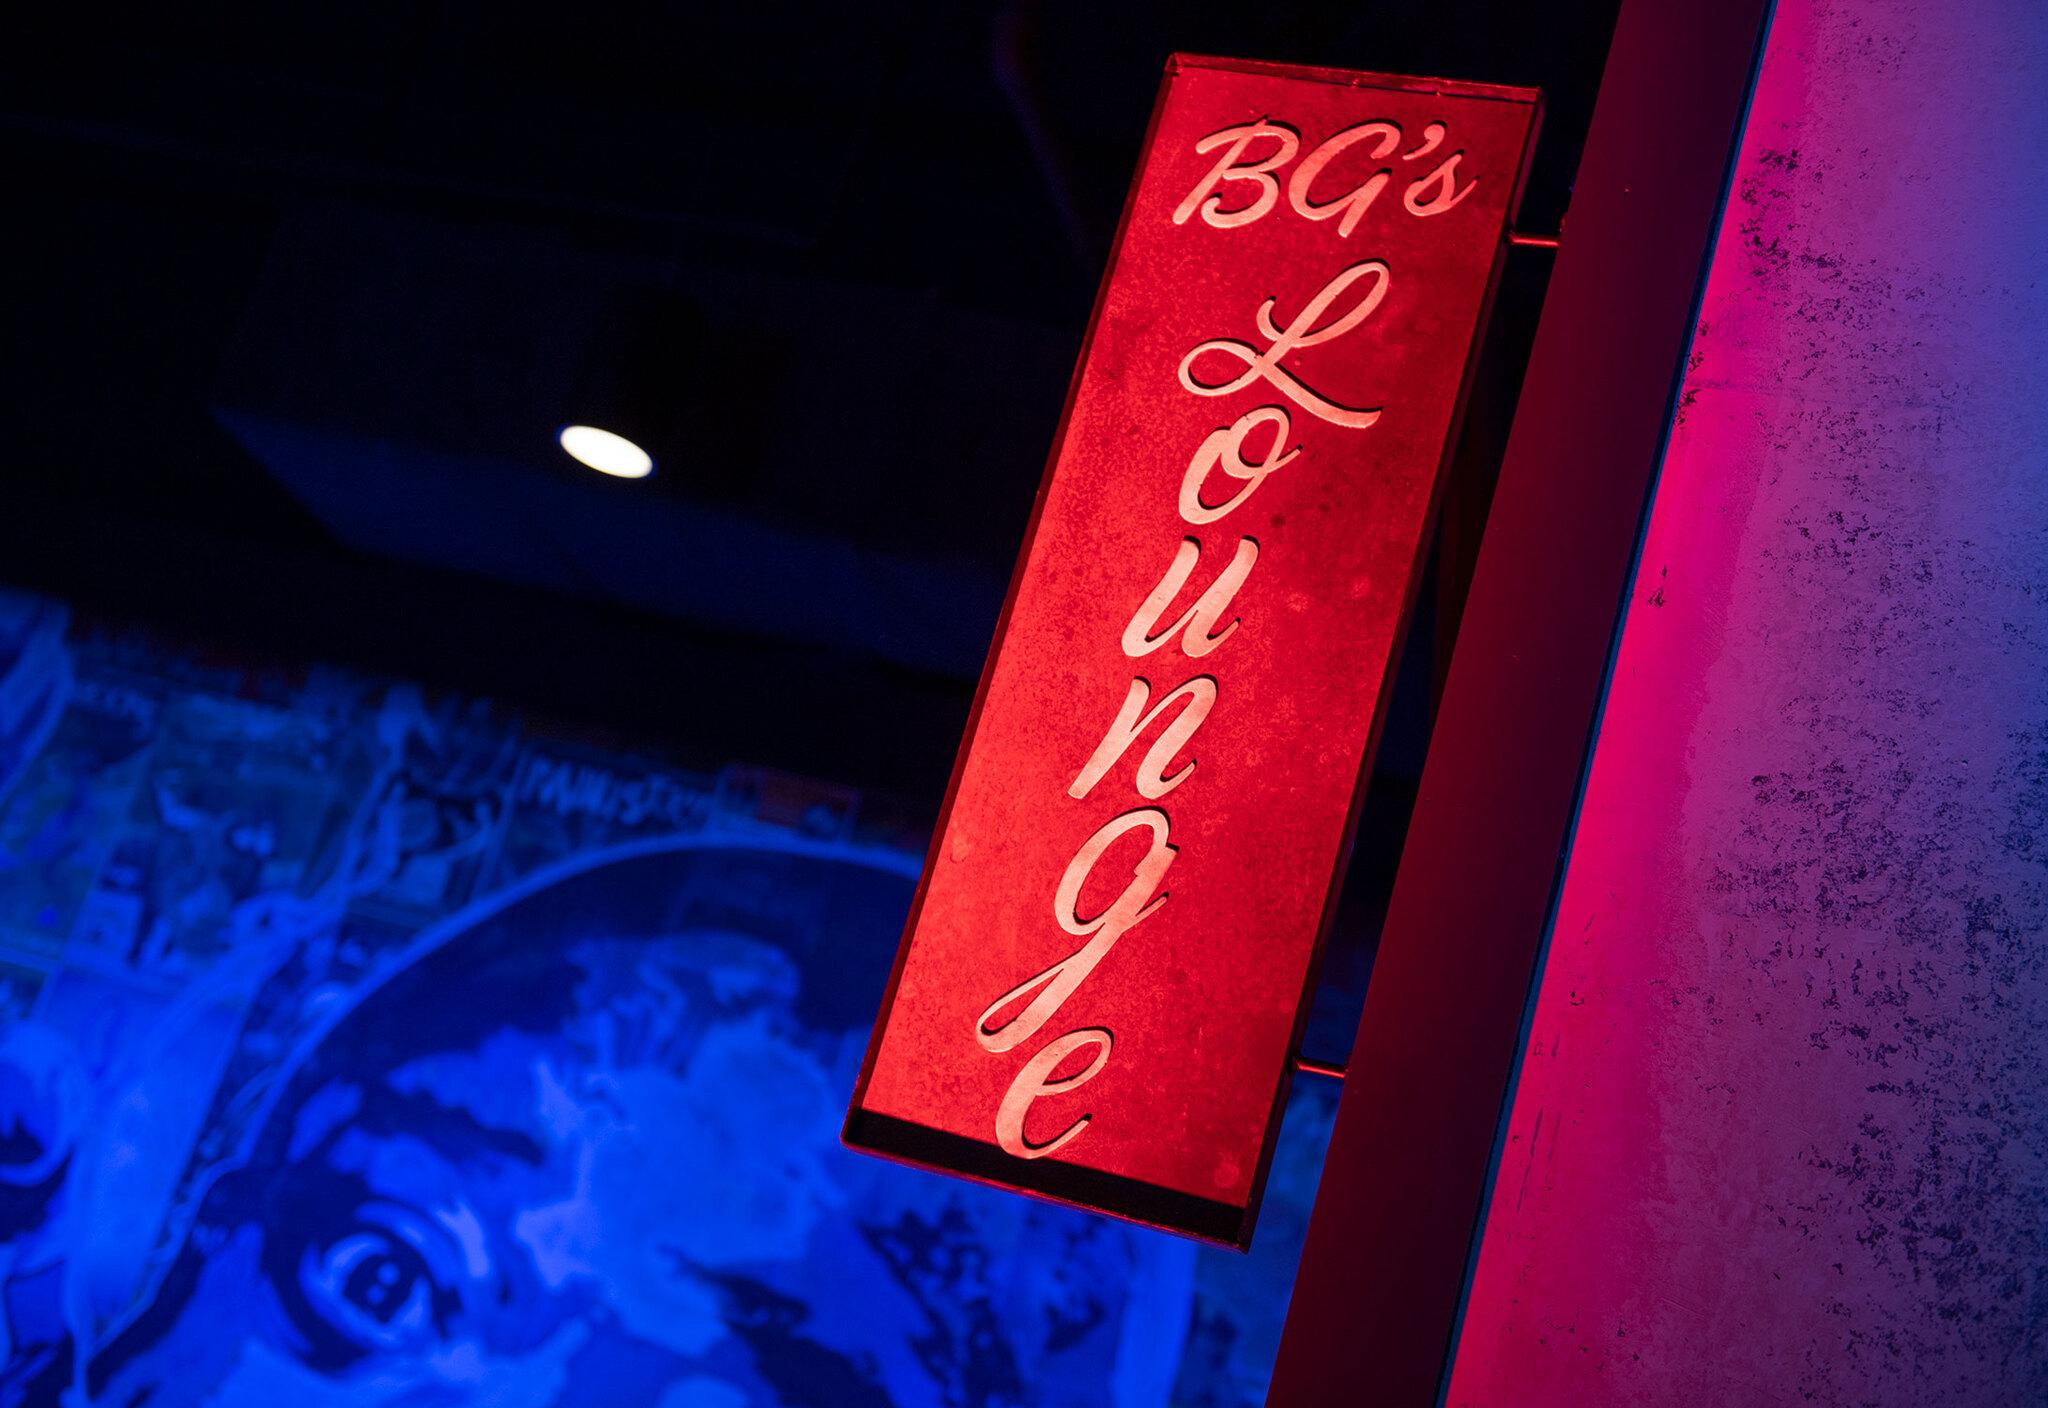 BG'S LOUNGE SIGN